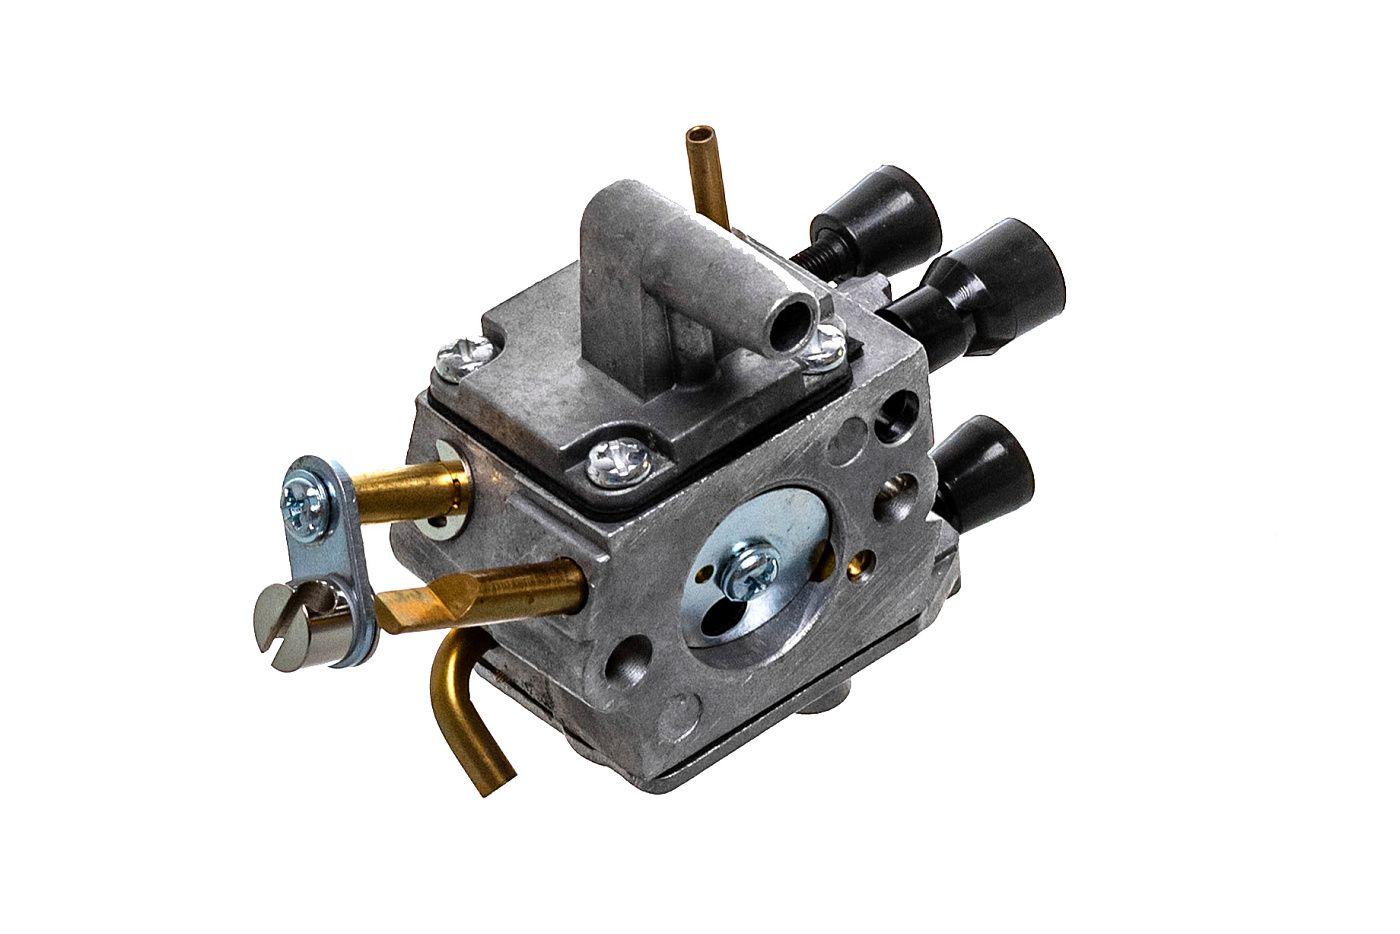 Karburátor Stihl FS400 FS450 FS480 NOVÝ TYP SUPER AKCE